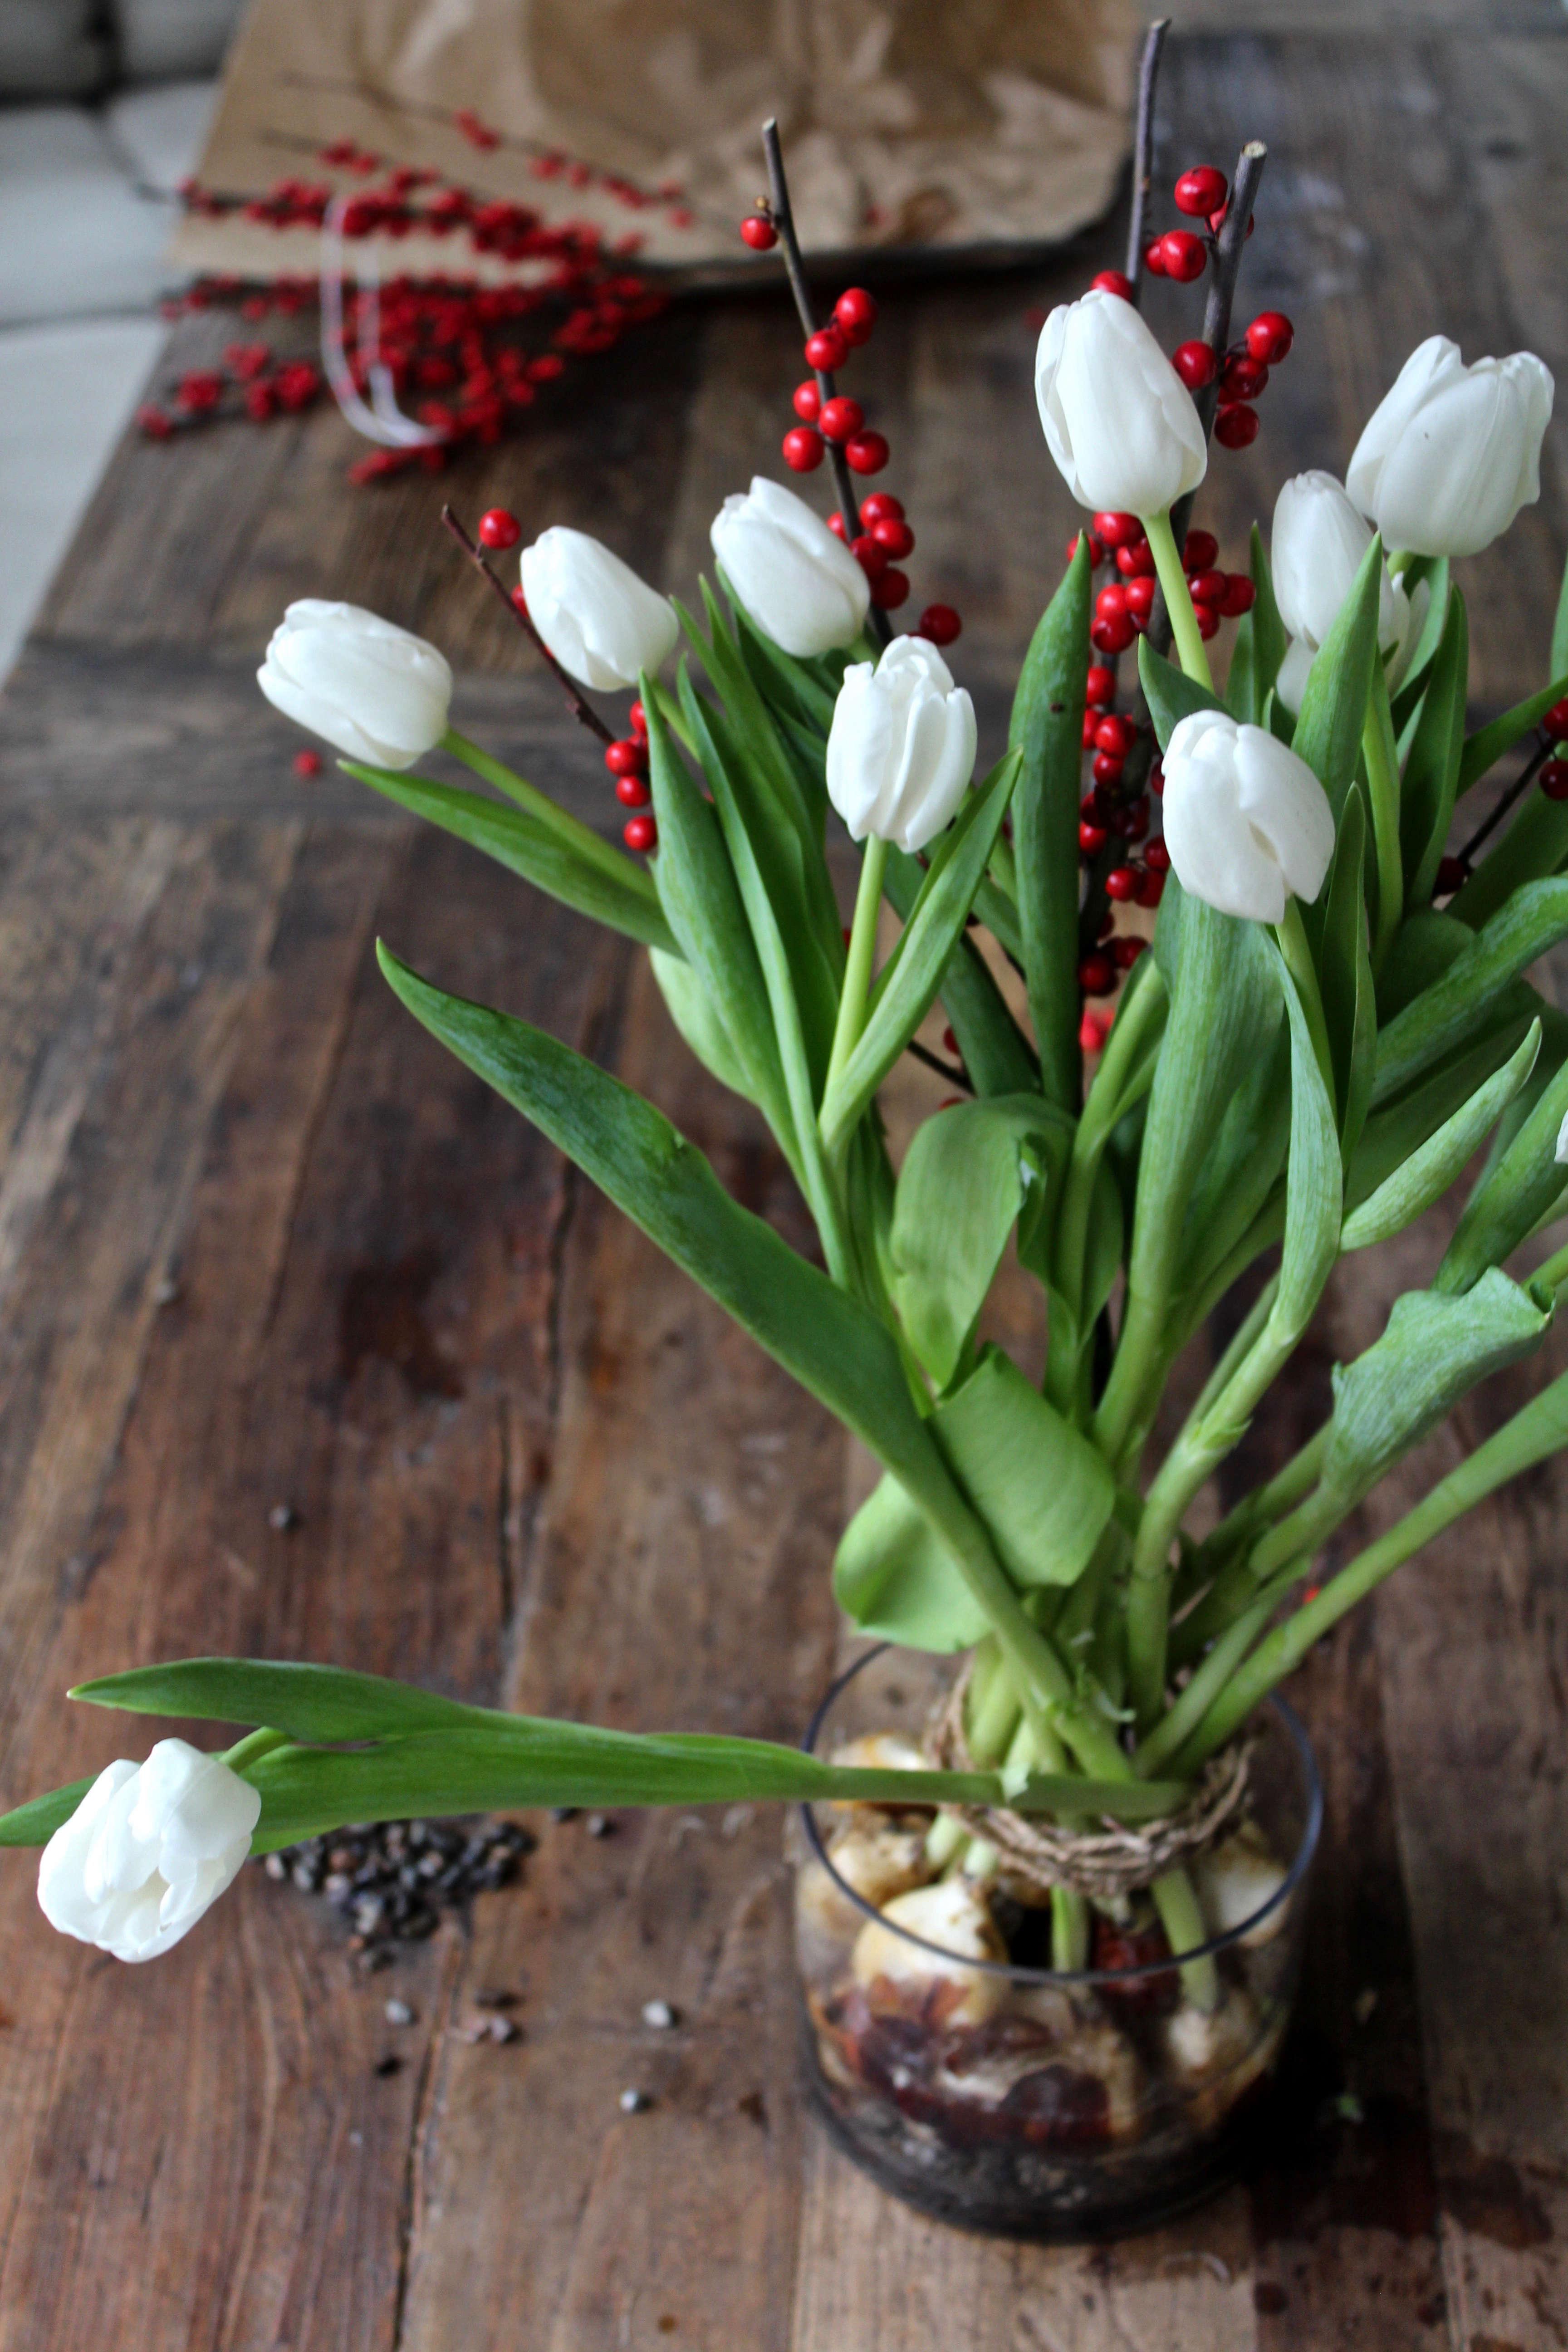 tulips-on-the-bulb-michelle-slatalla-img-3777